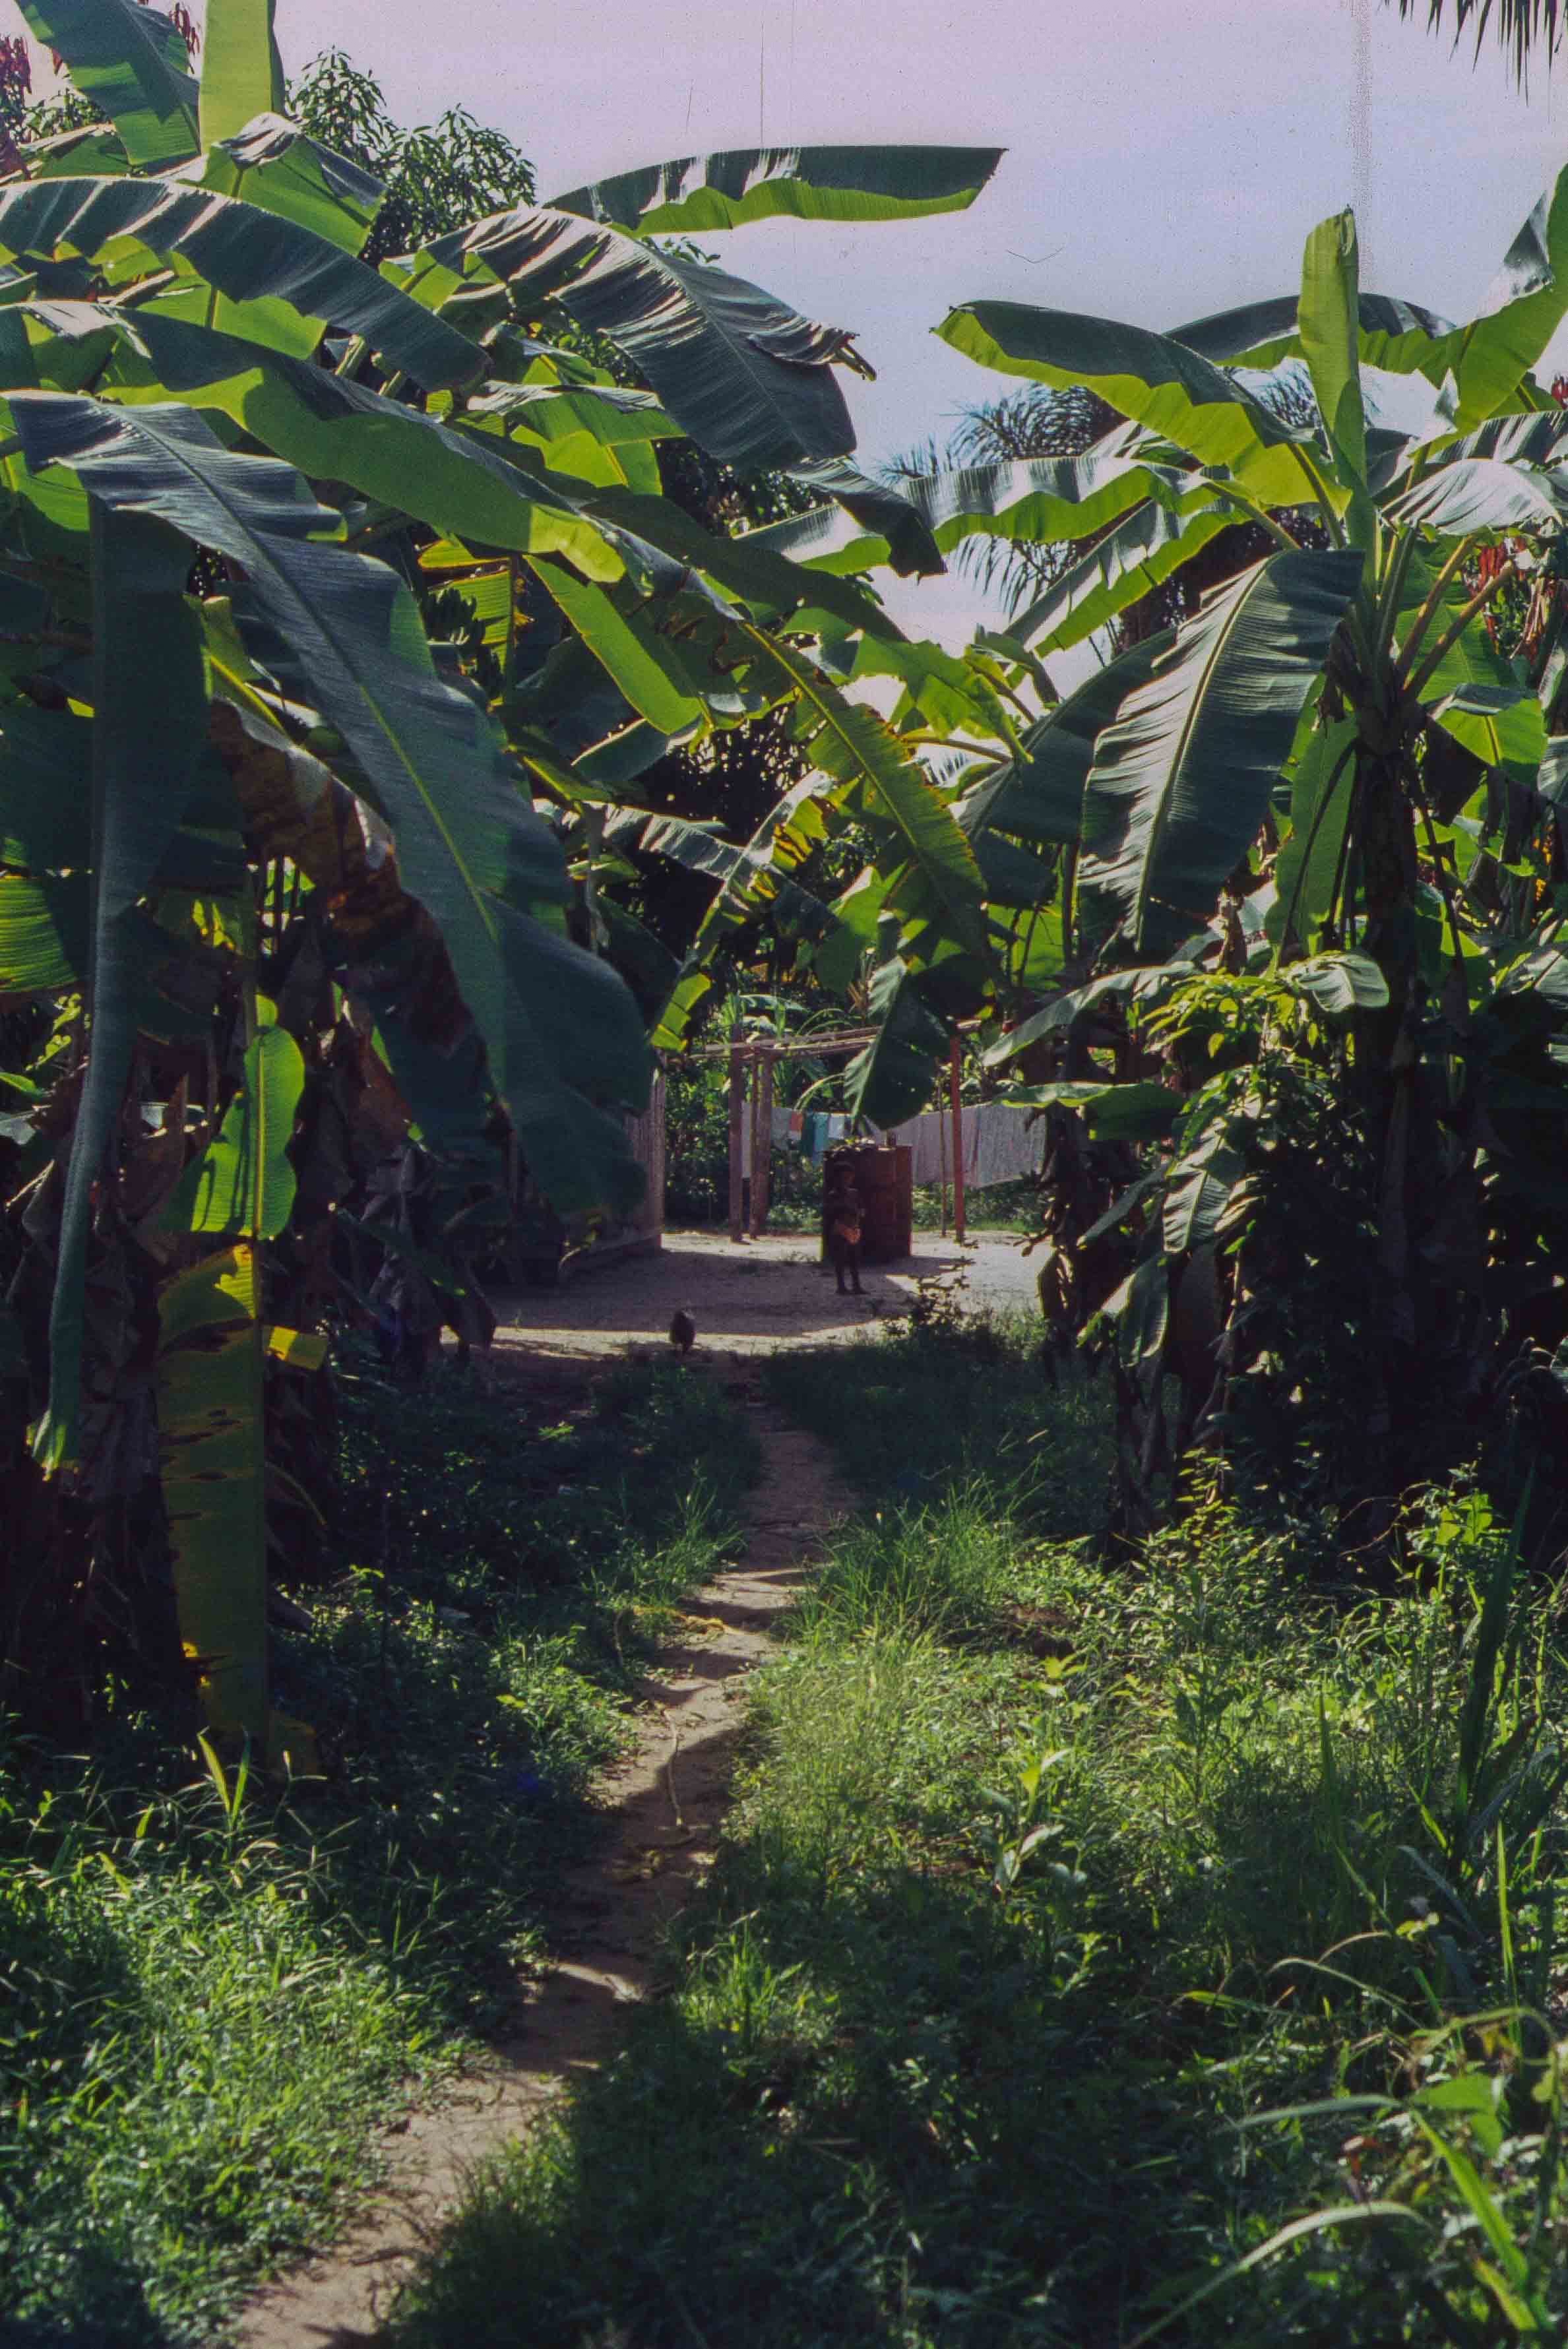 377. Suriname